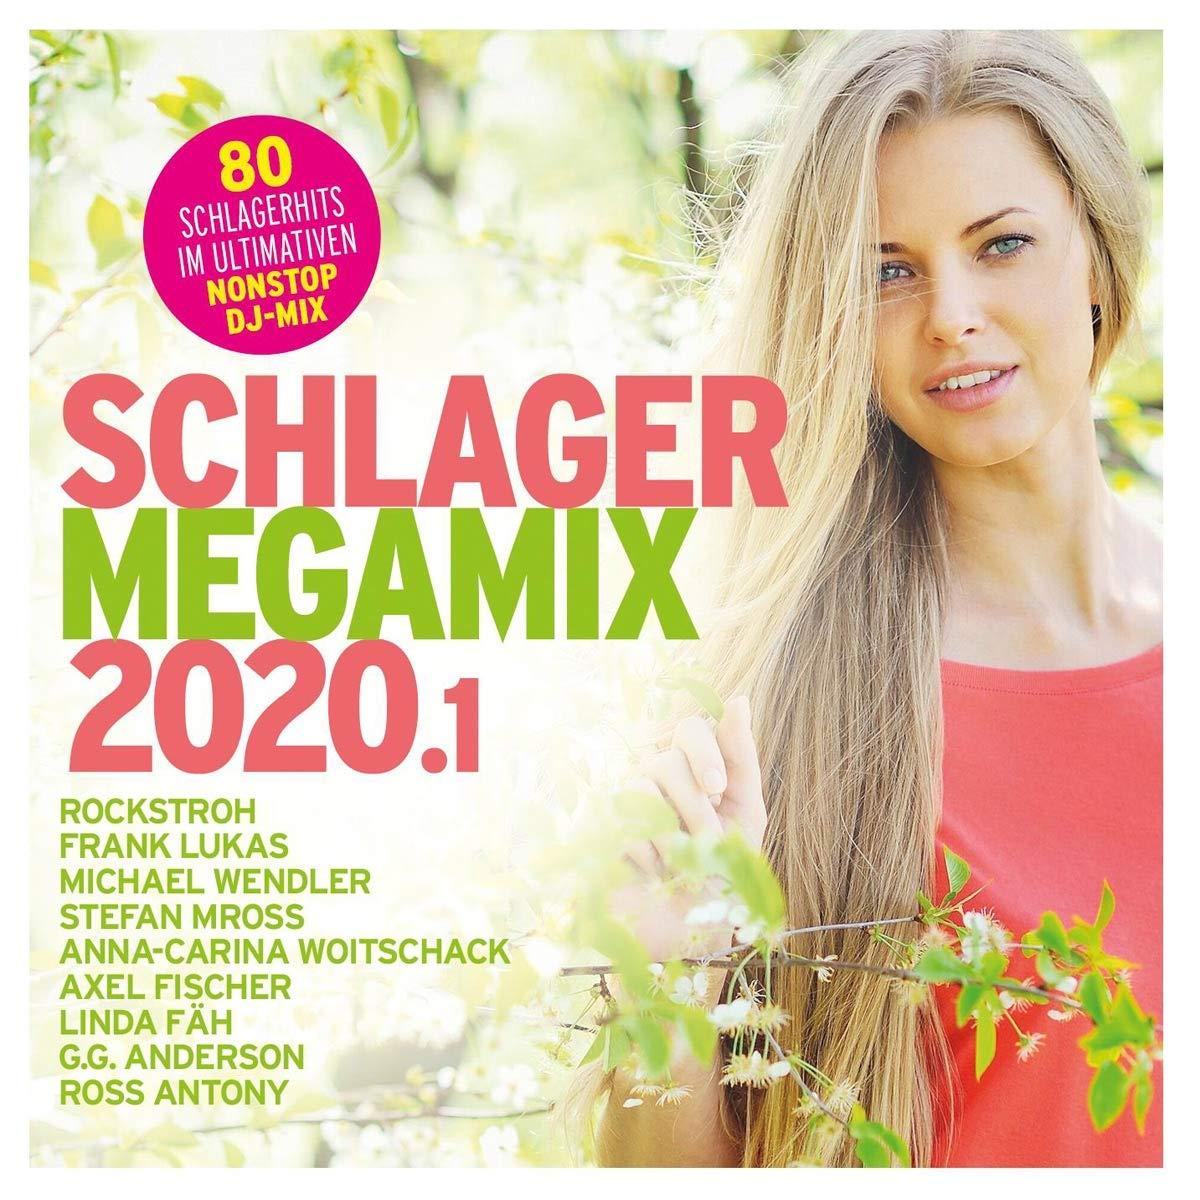 Schlager Megamix 2020.1